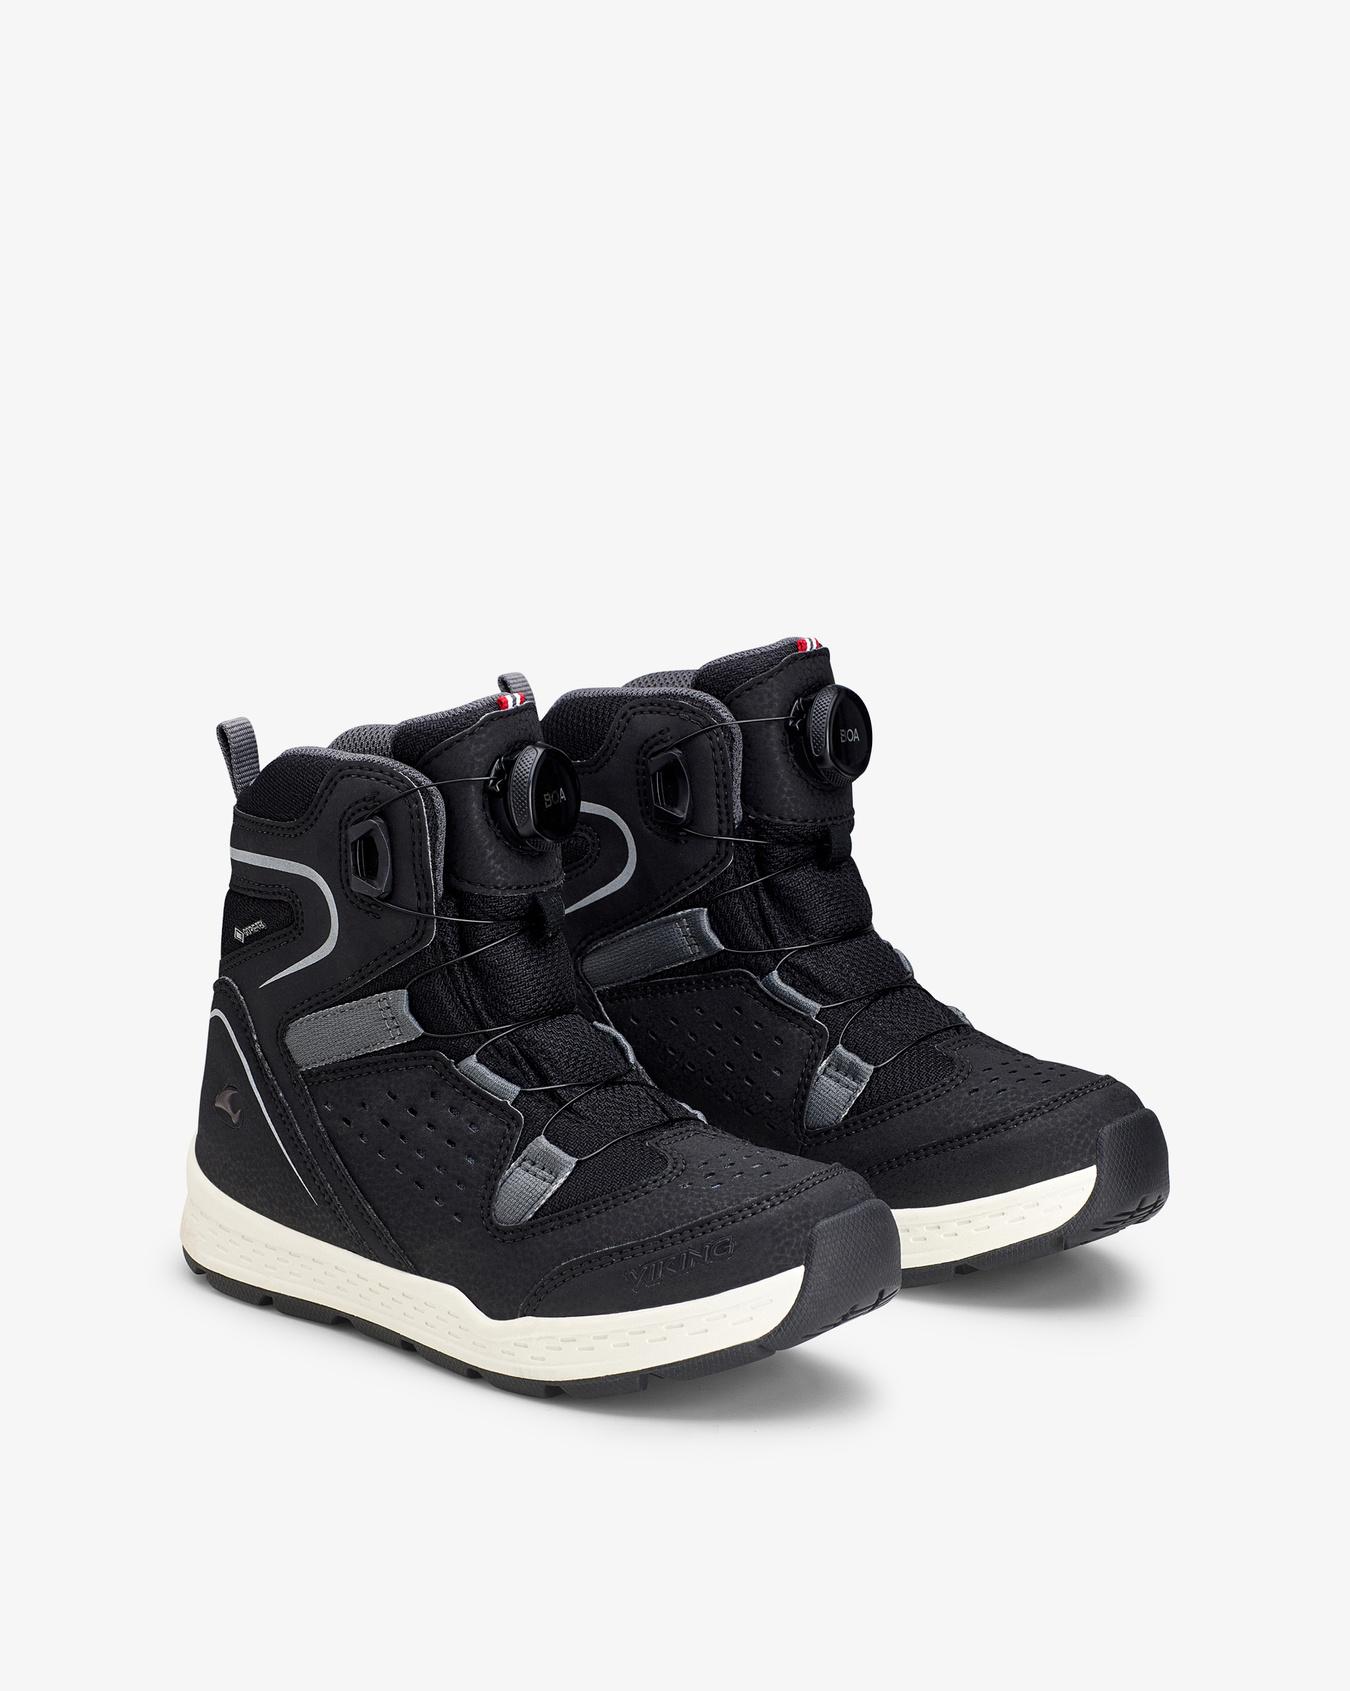 Espo GTX Black Winter Boots